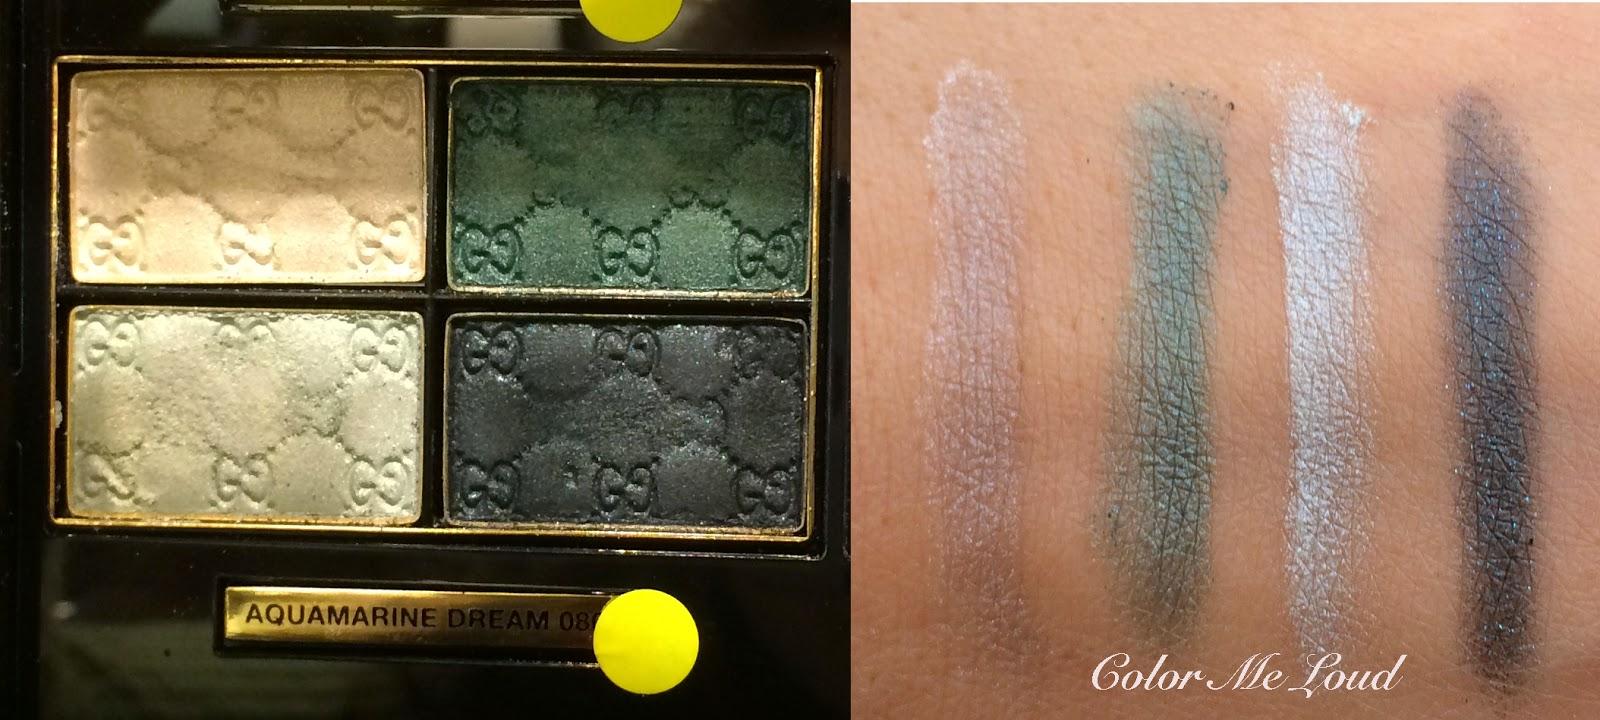 Swatch: Gucci Magnetic Color Eye Shadow Quad in Aquamarine Dream